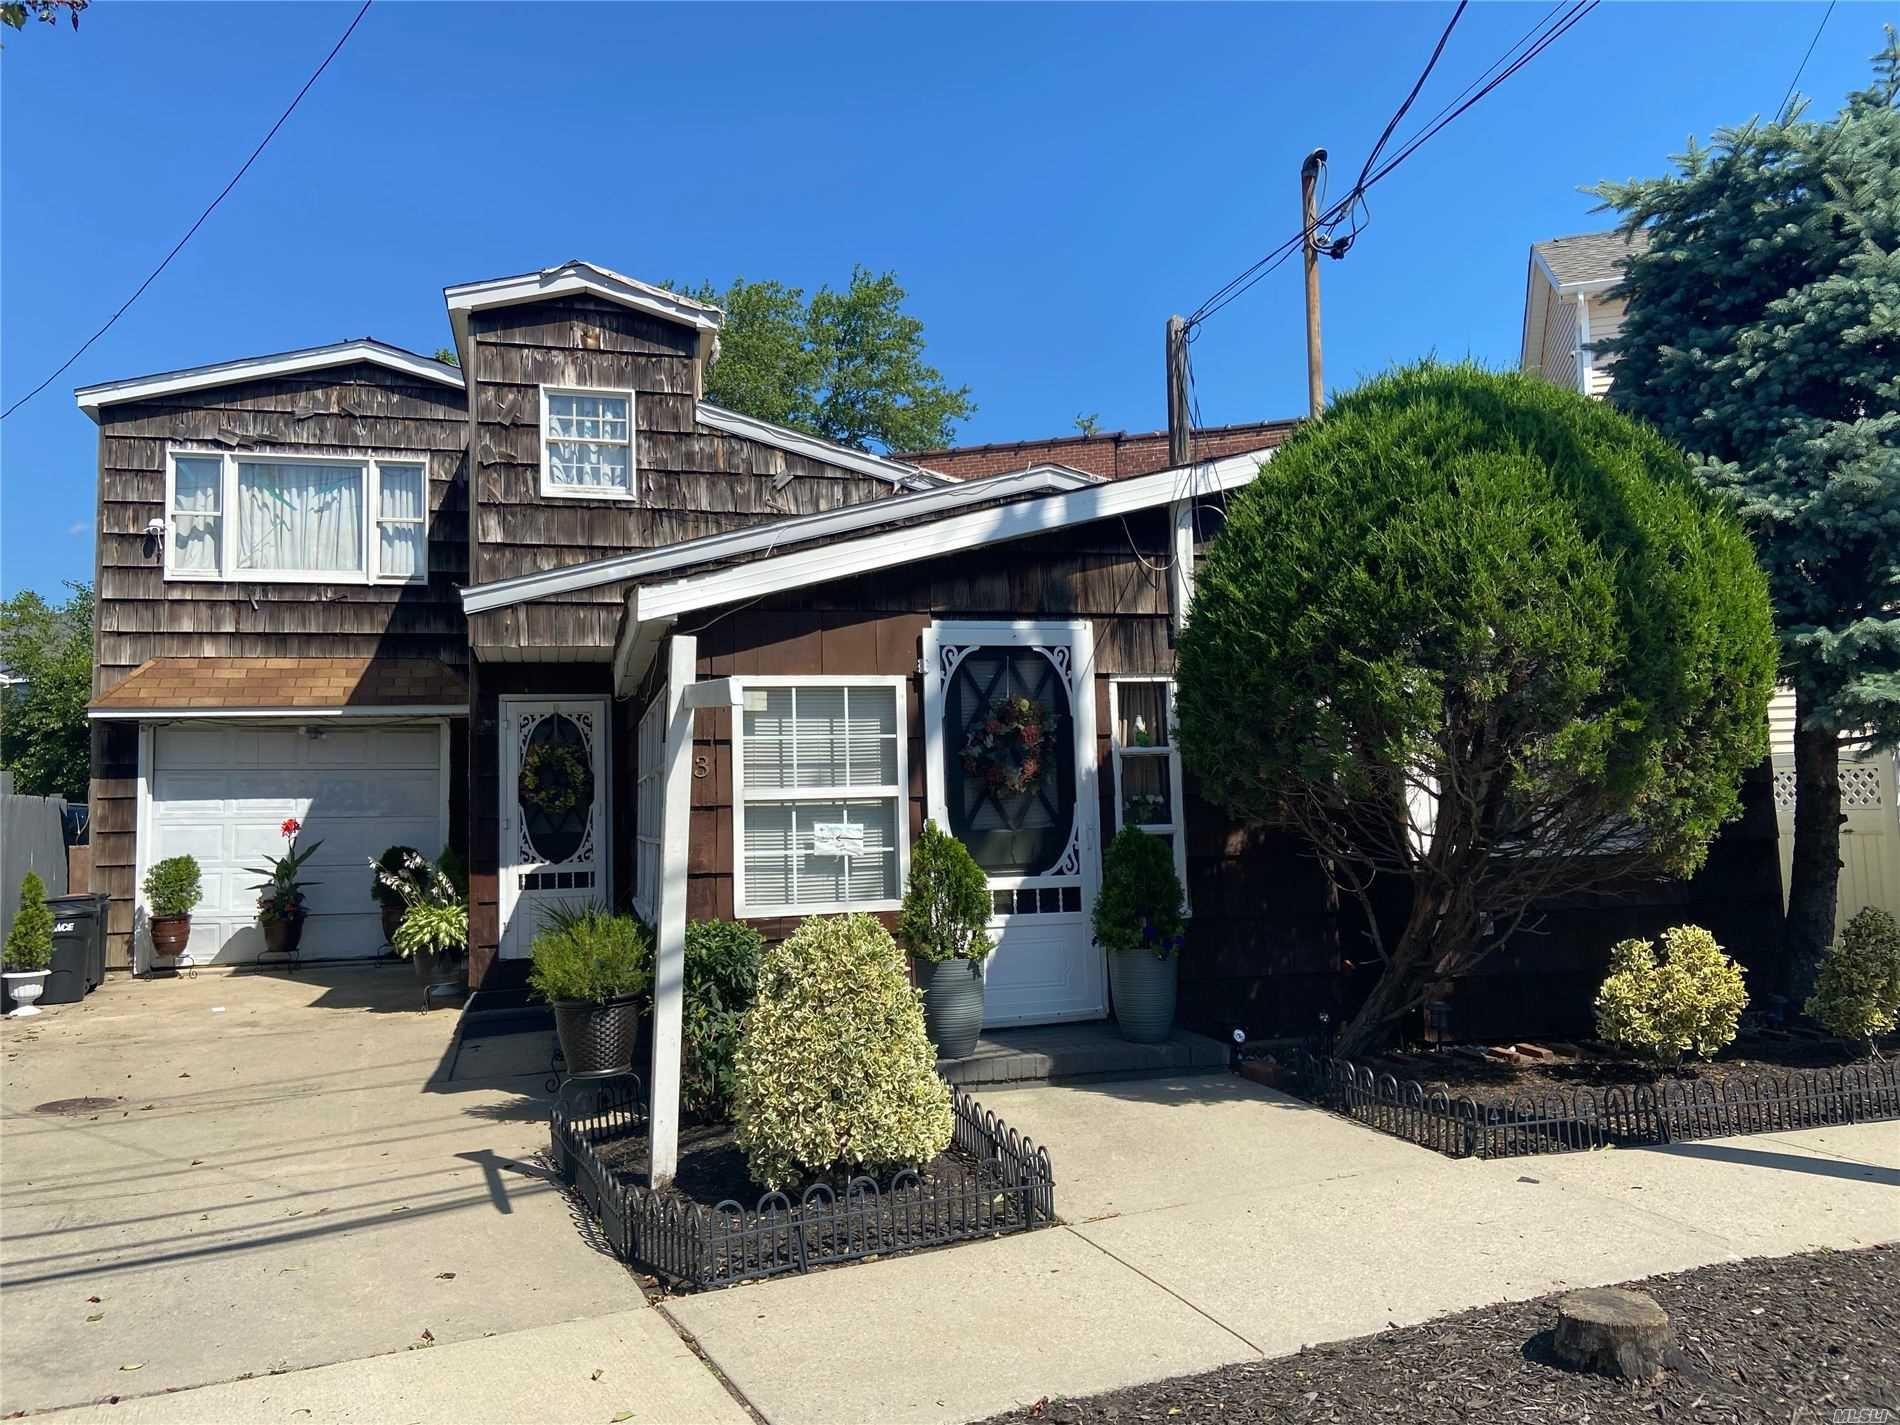 73 Front Street, East Rockaway, NY 11518 - MLS#: 3230697